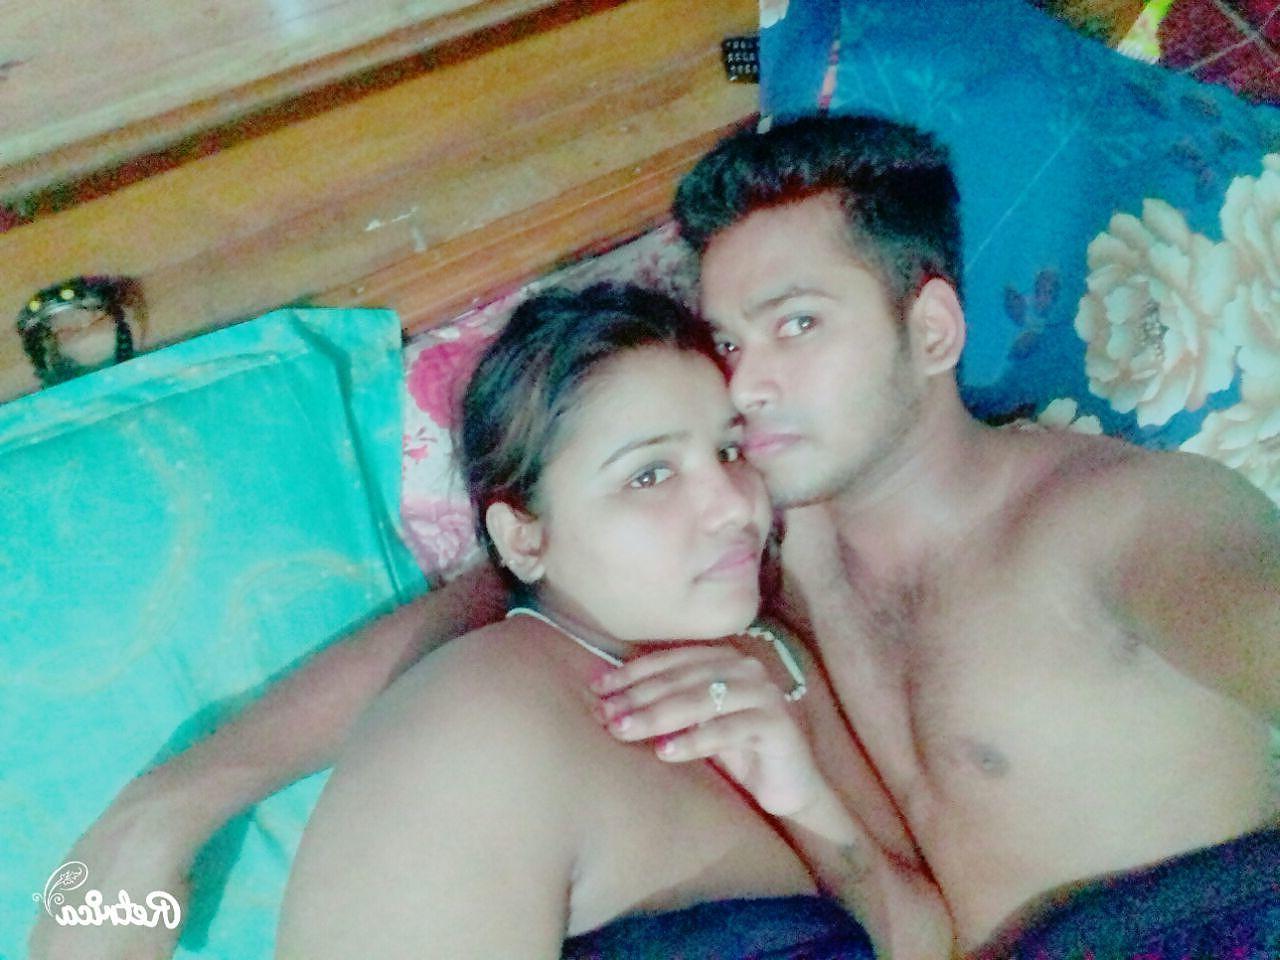 Bangladesh sex of naked